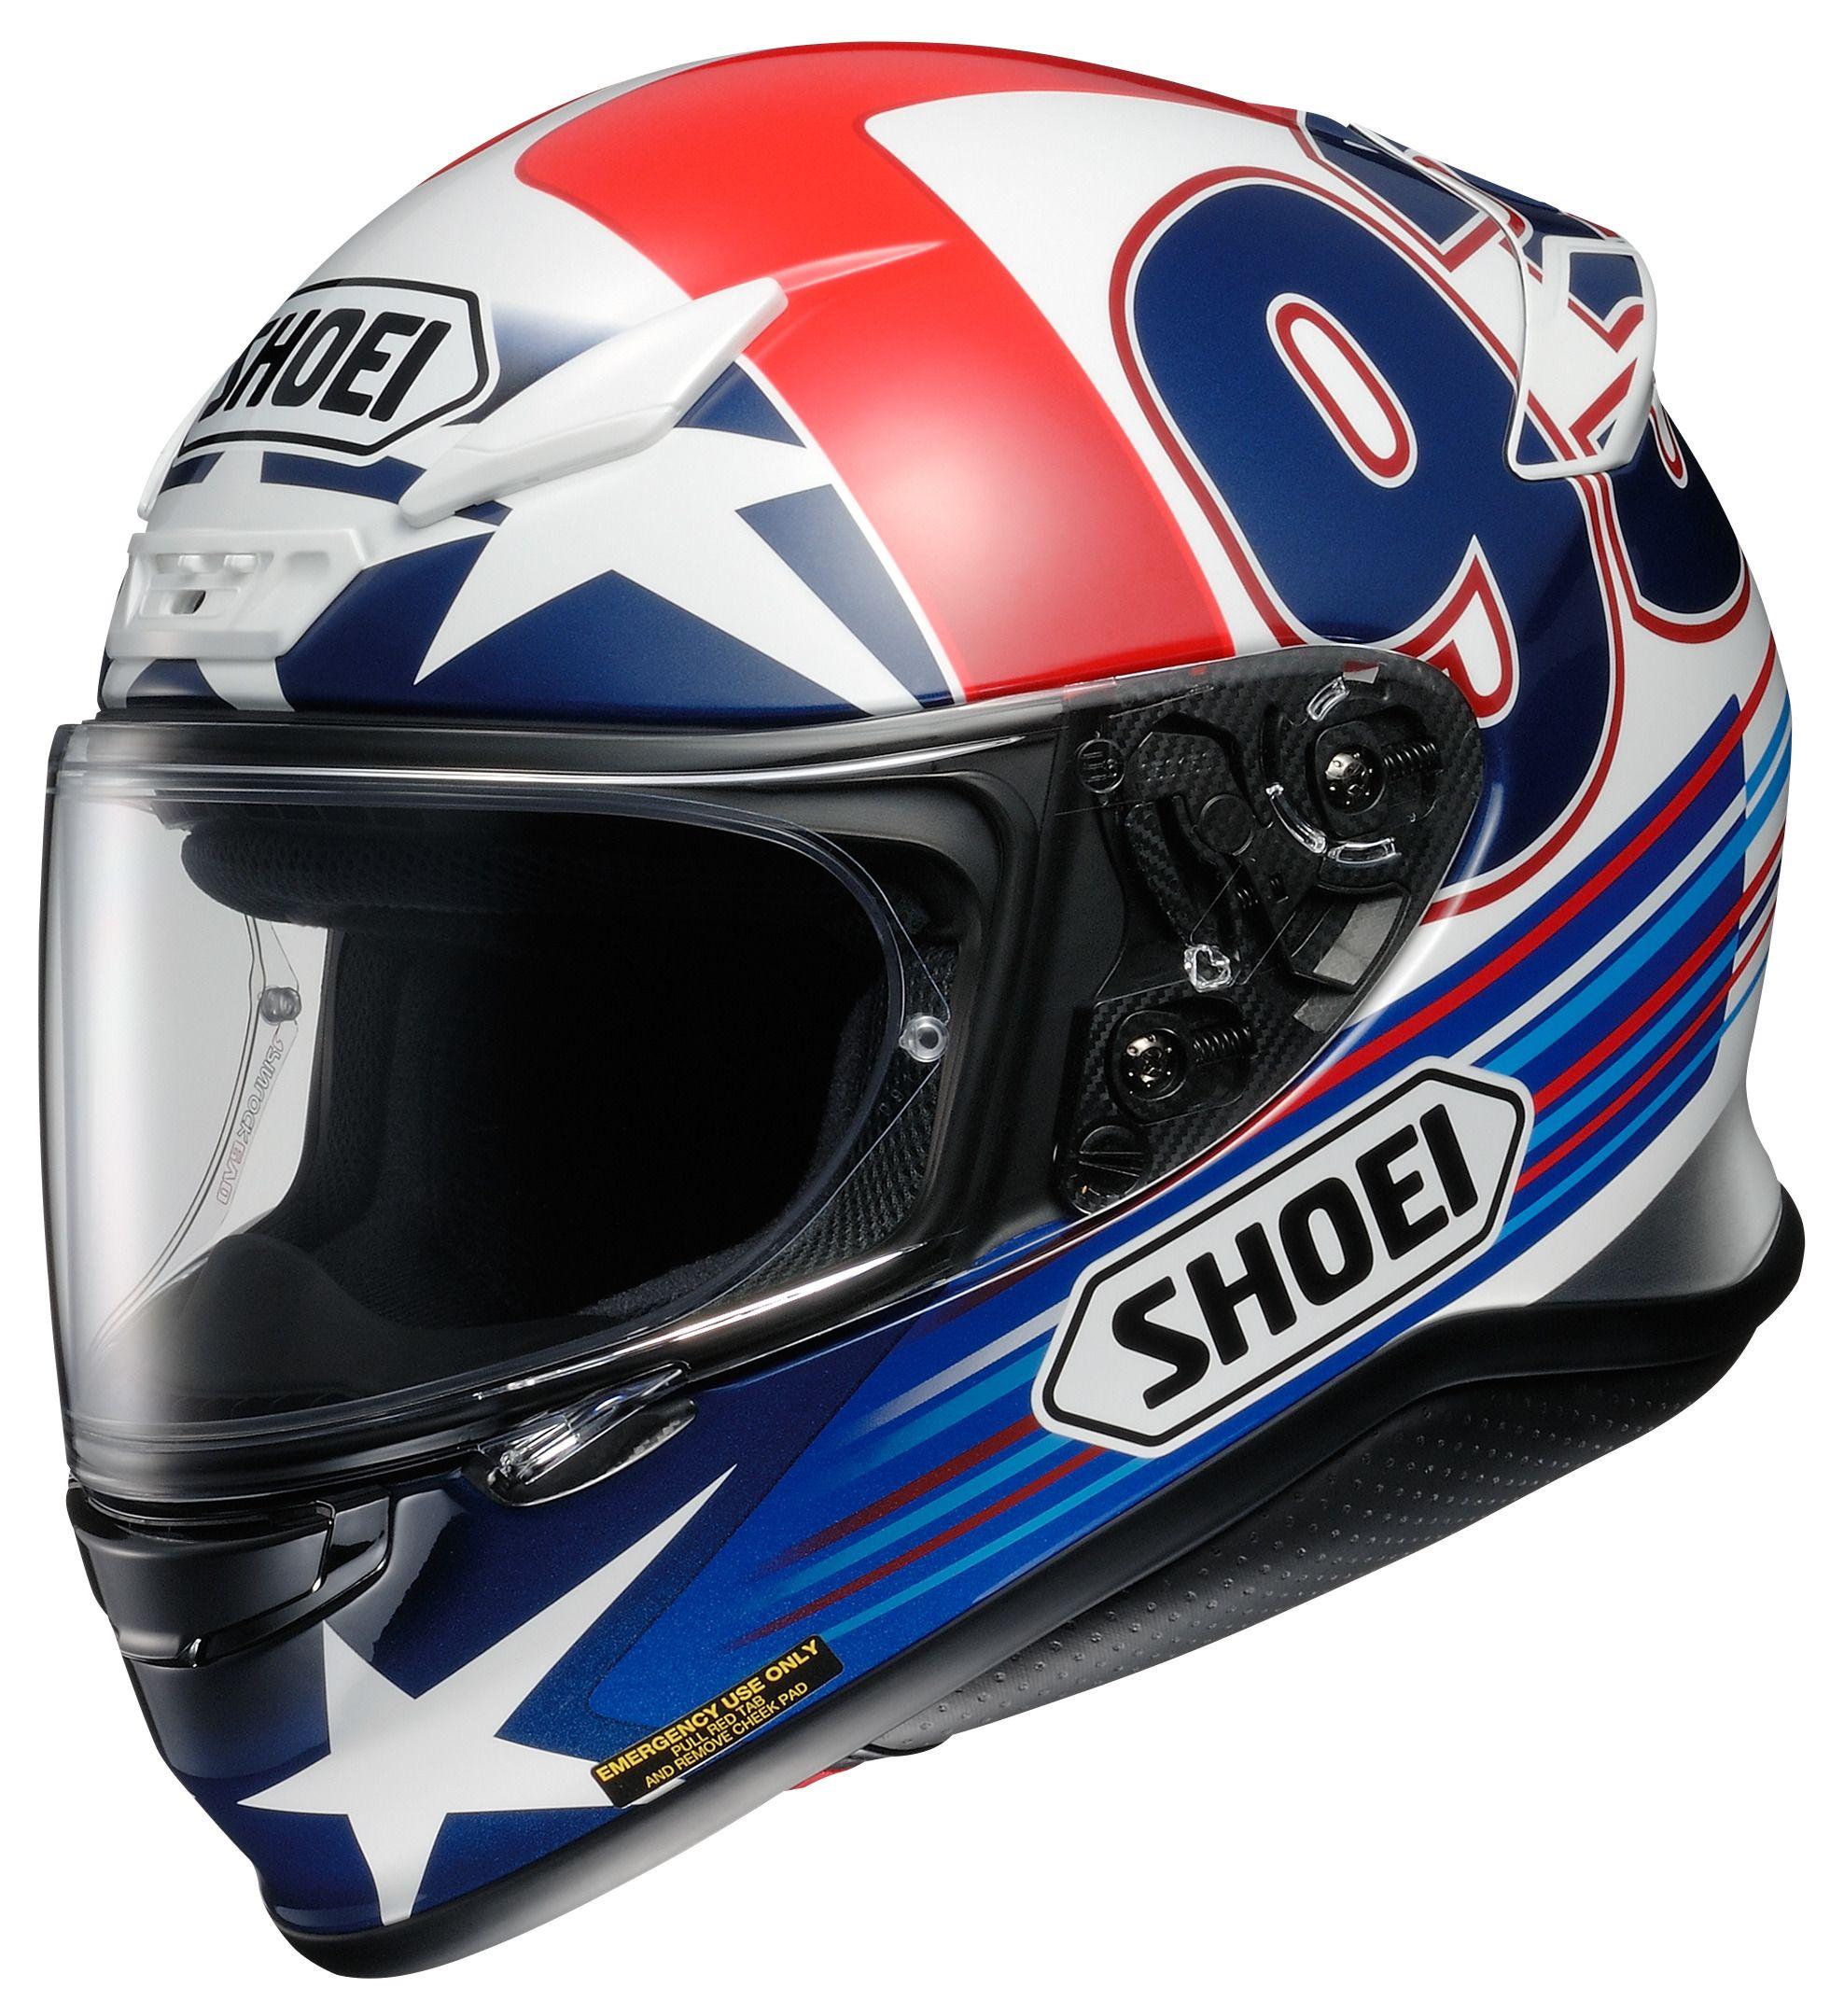 Shoei Rf 1200 Indy Marquez Helmet 30 188 03 Off